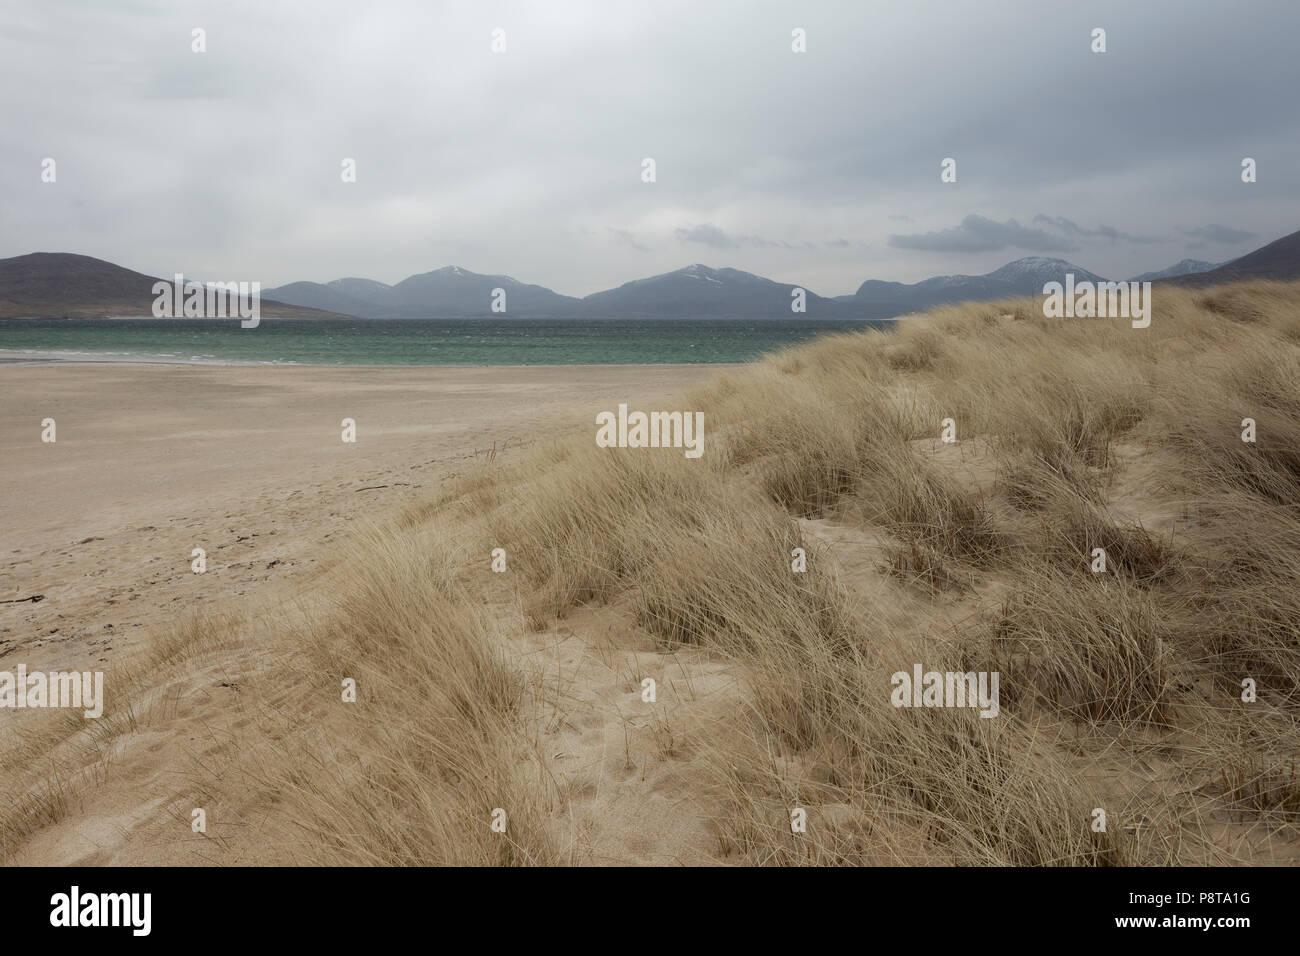 Landscape image of the coast around the Isle of Harris, Outer Hebrides, Scotland. - Stock Image